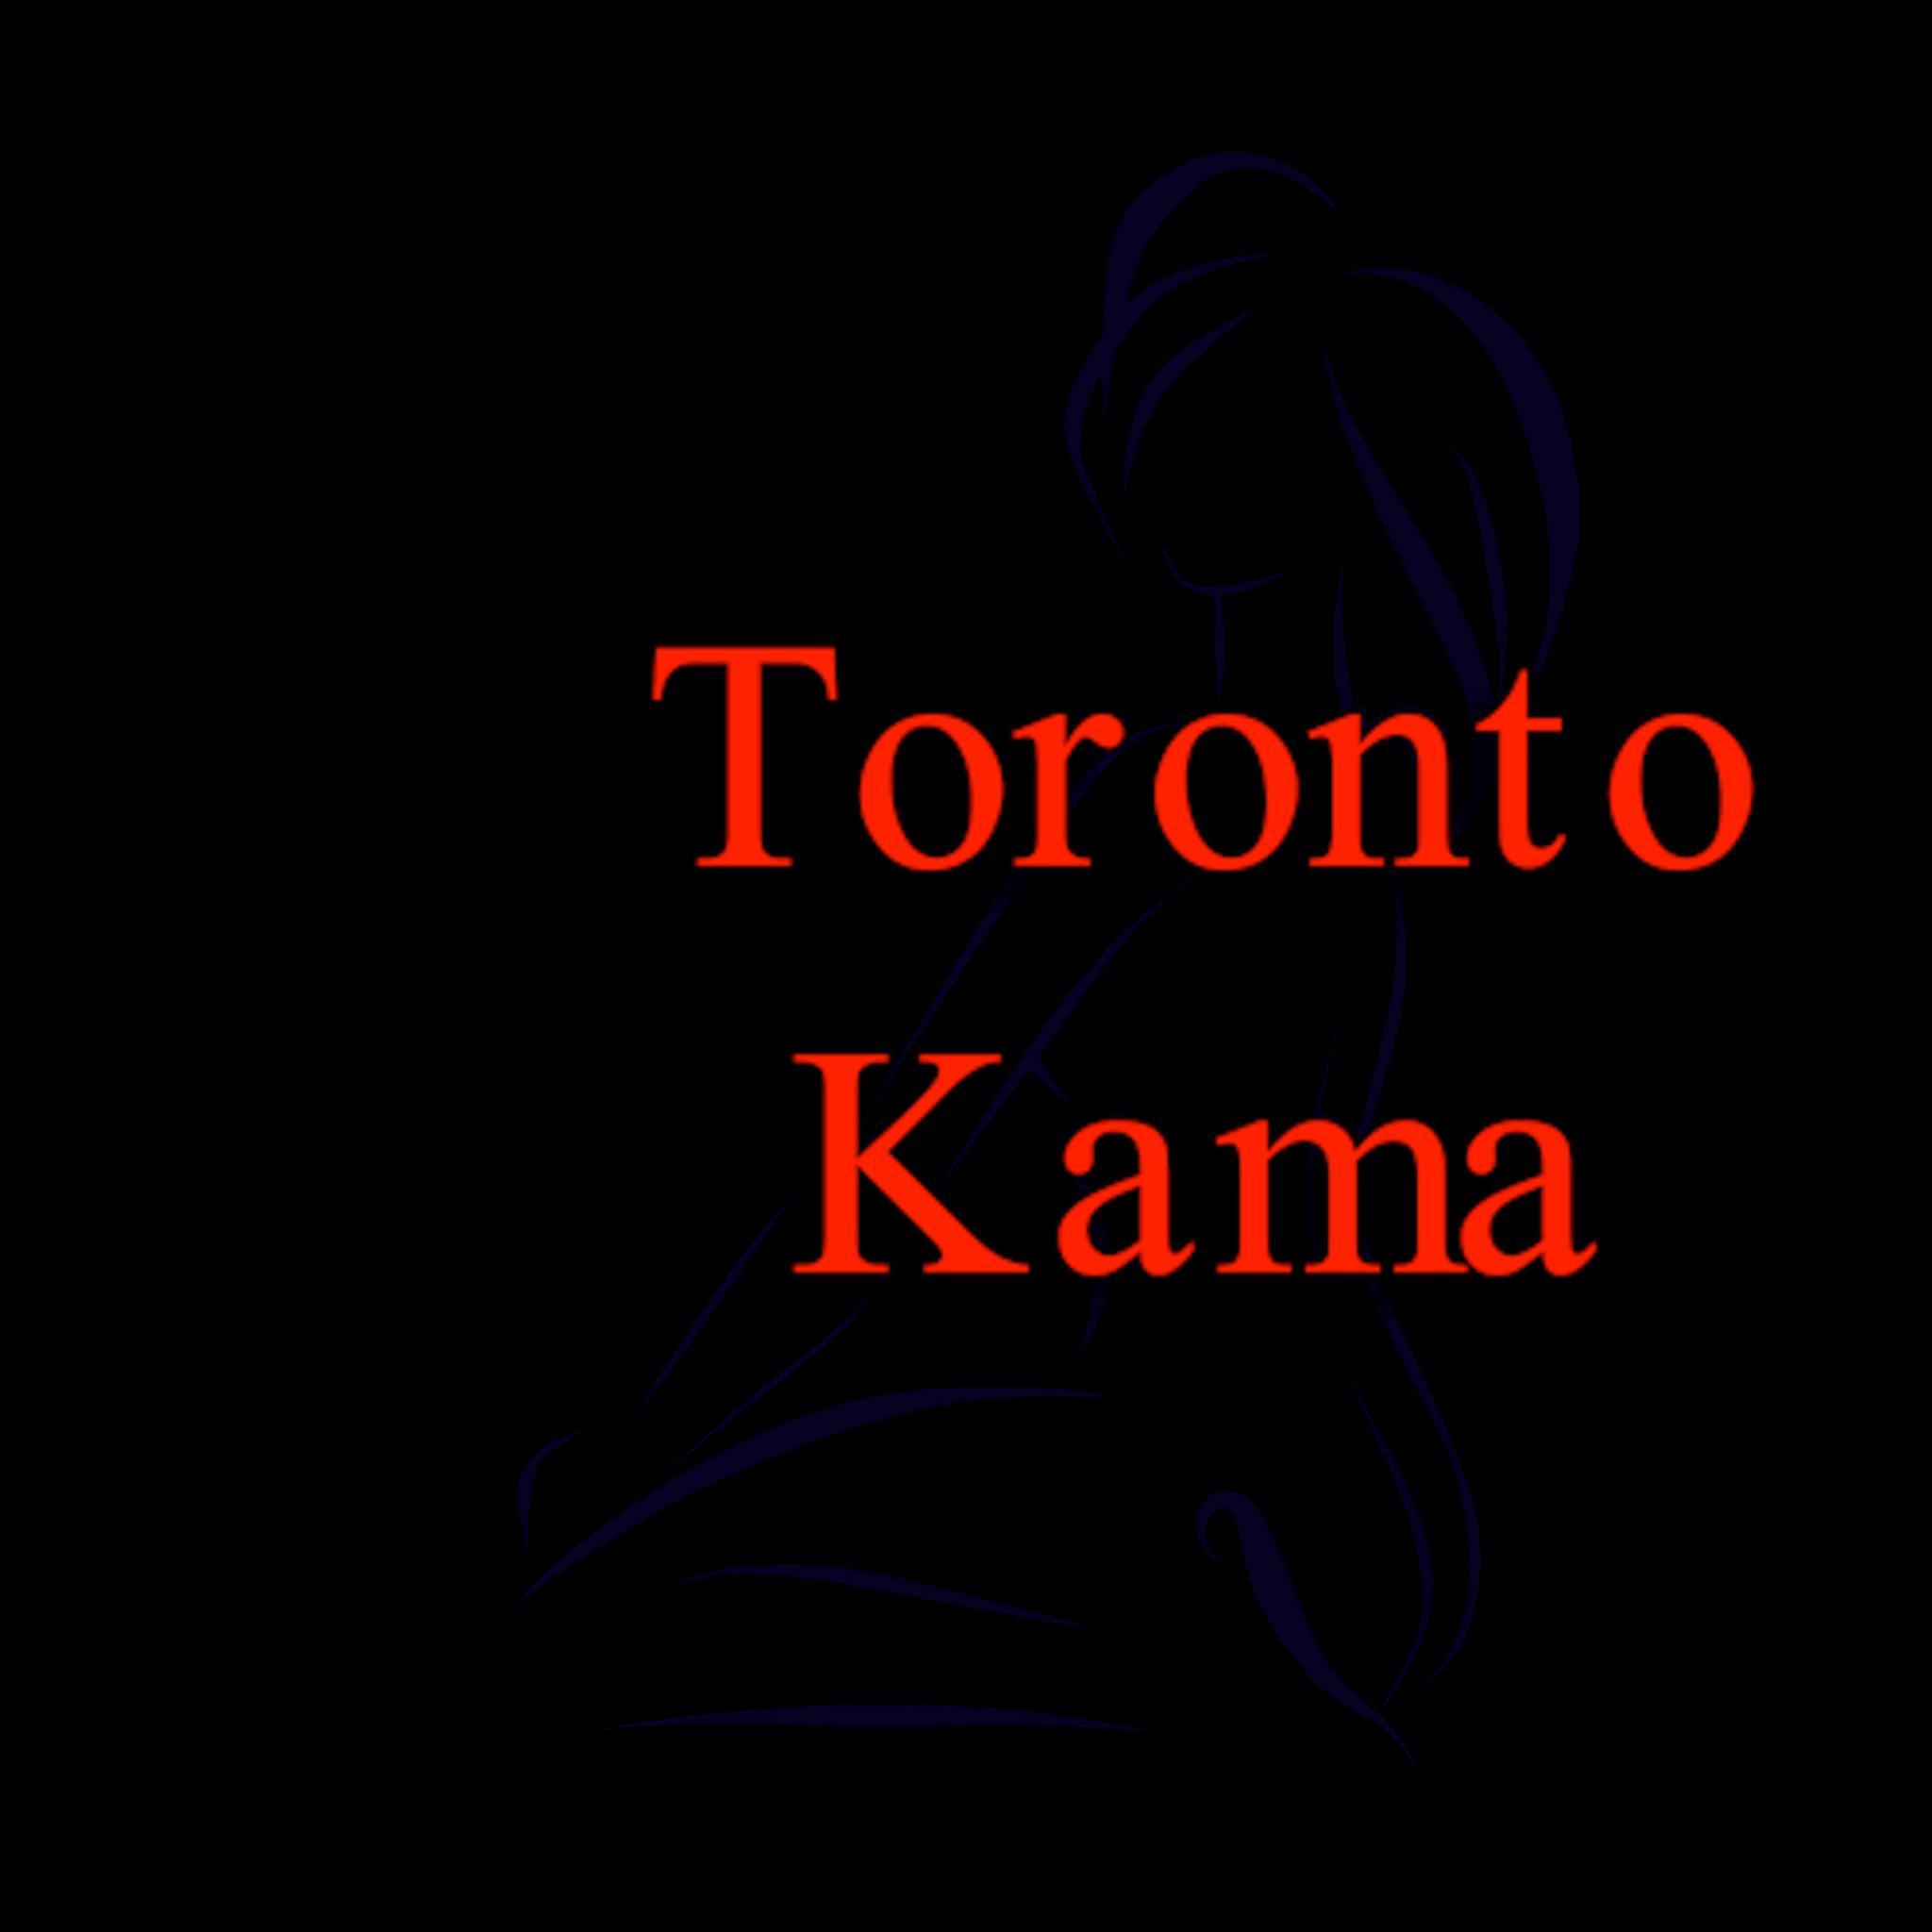 Toronto Escorts